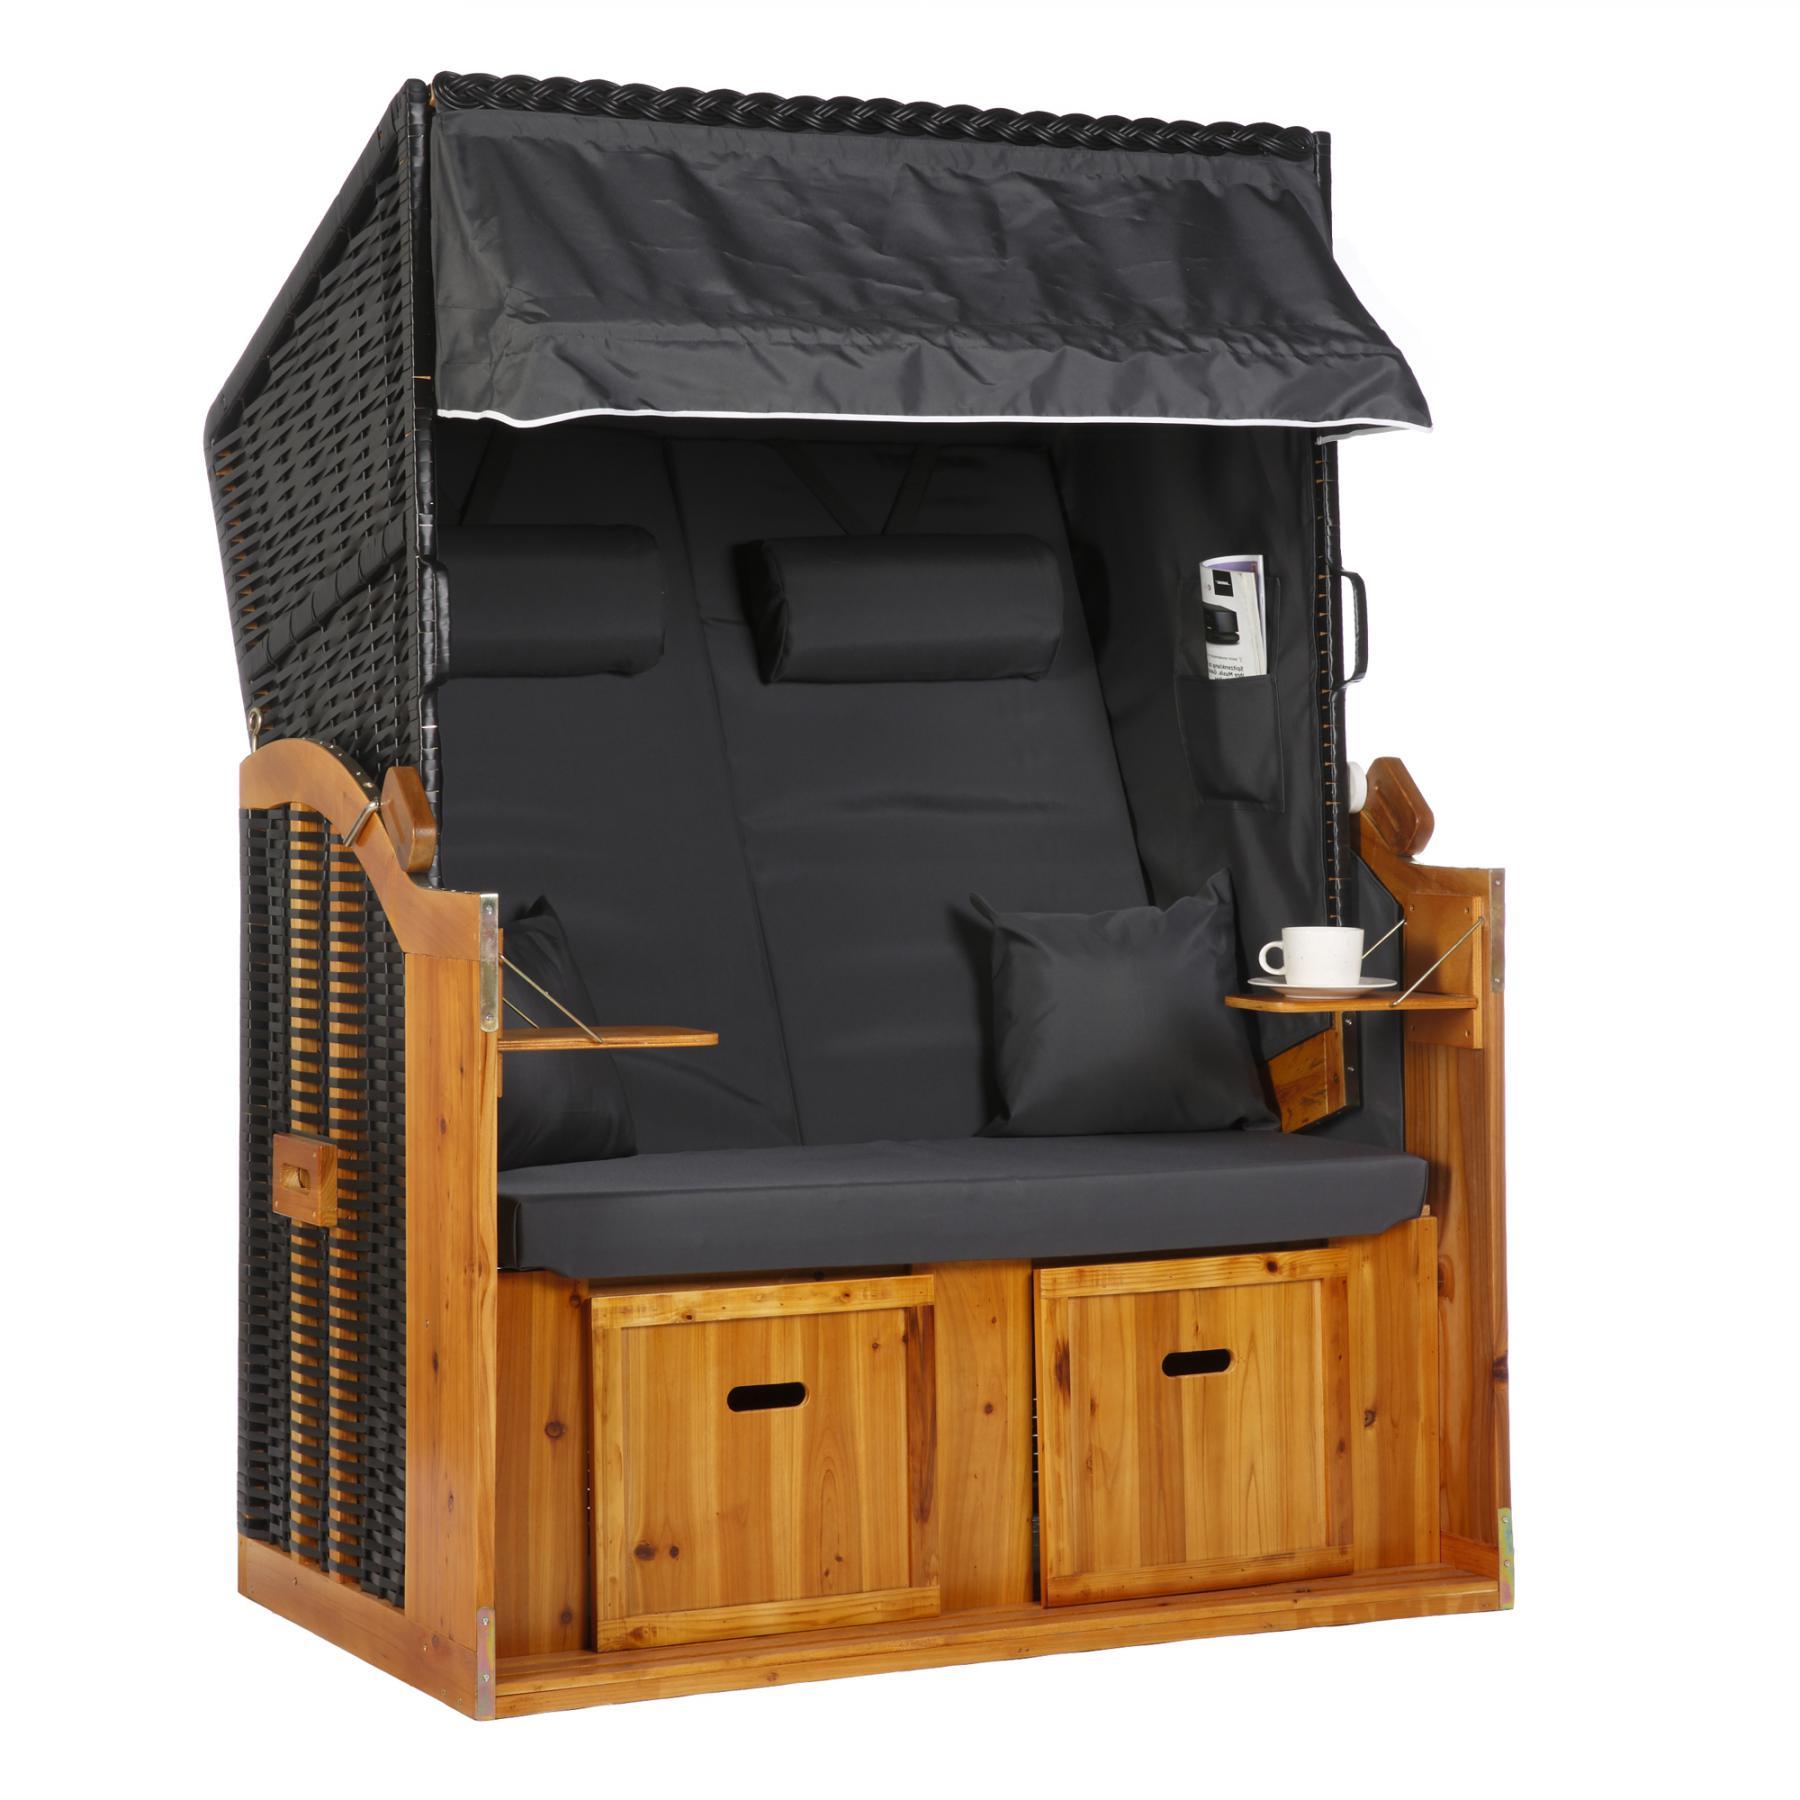 strandkorb volllieger grau rugbyclubeemland. Black Bedroom Furniture Sets. Home Design Ideas